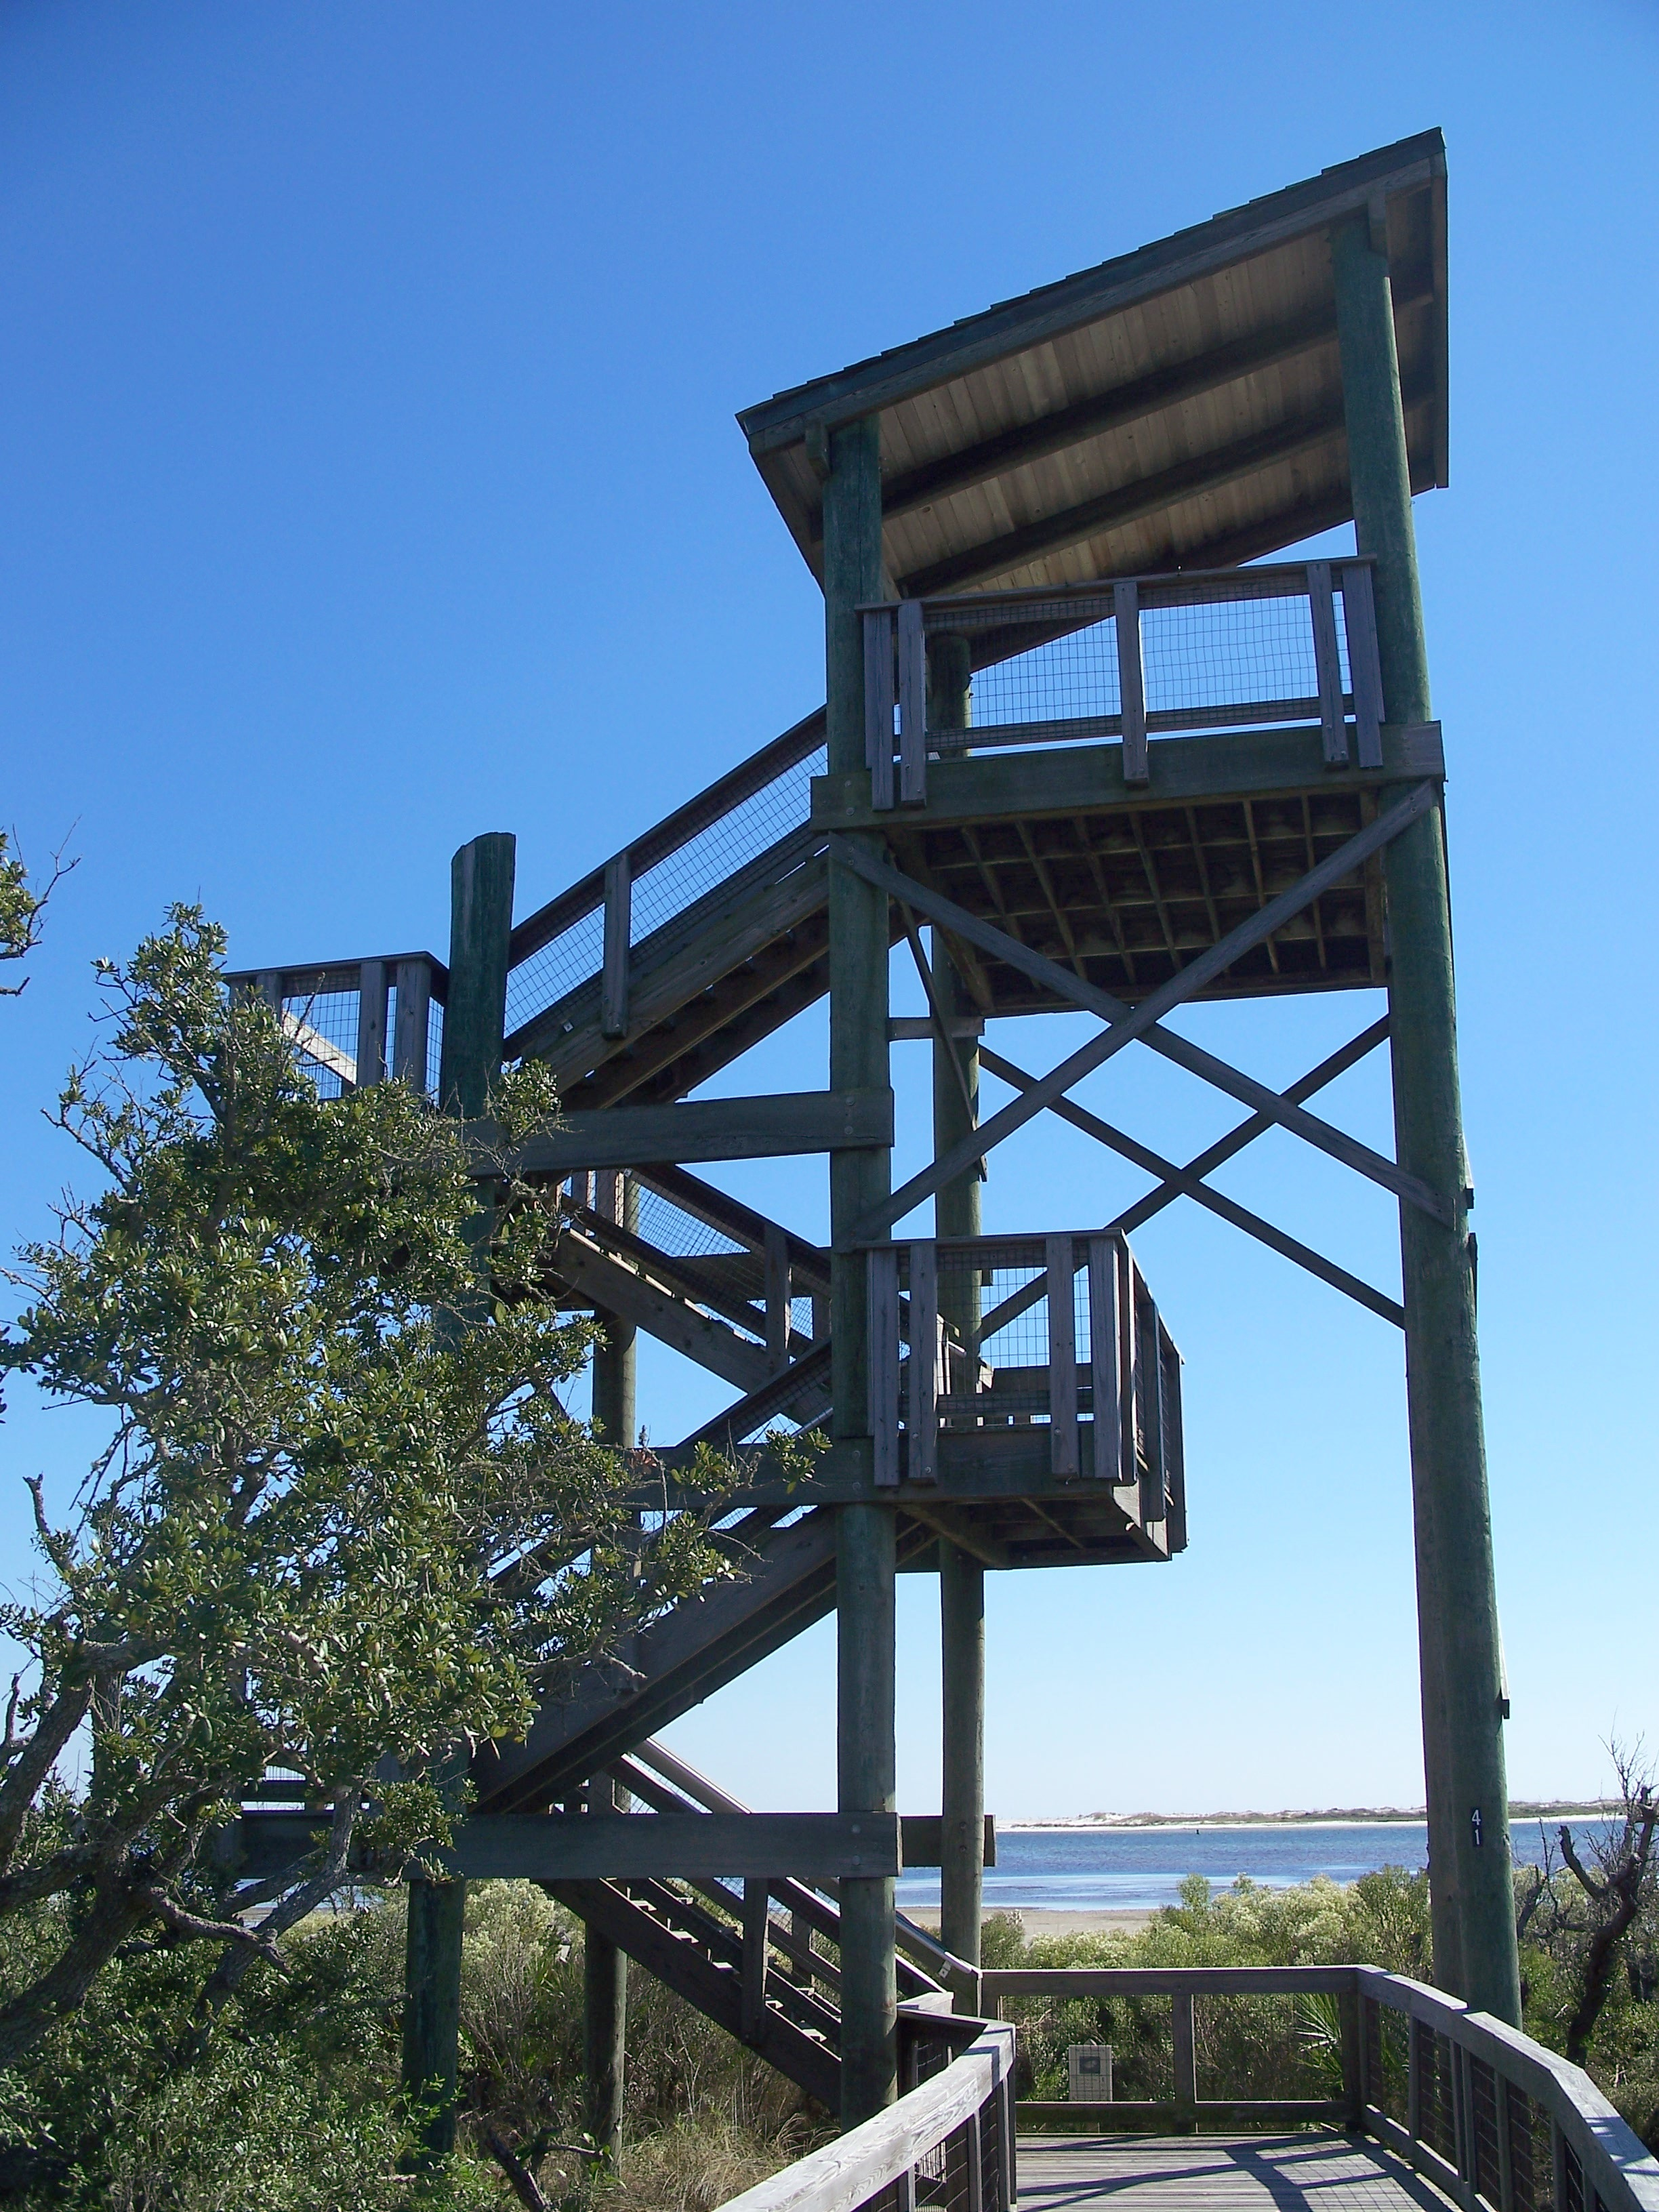 File:Pensacola FL Big Lagoon SP obs tower01 jpg - Wikimedia